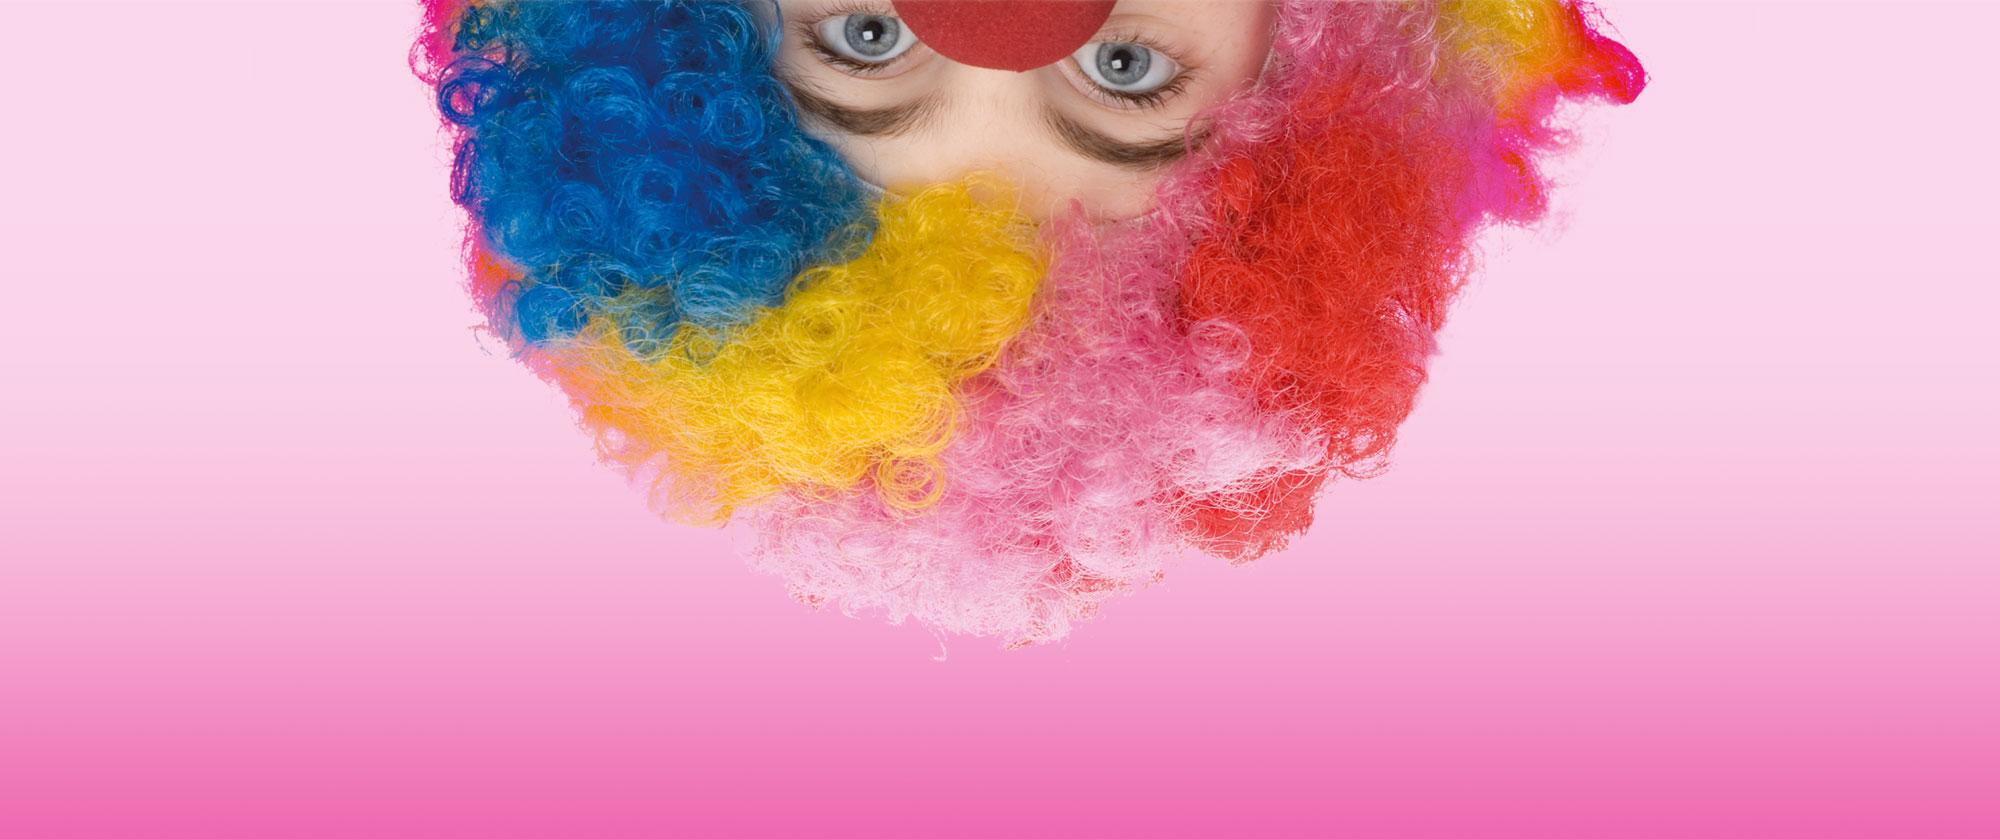 Karneval Clown steht Kopp